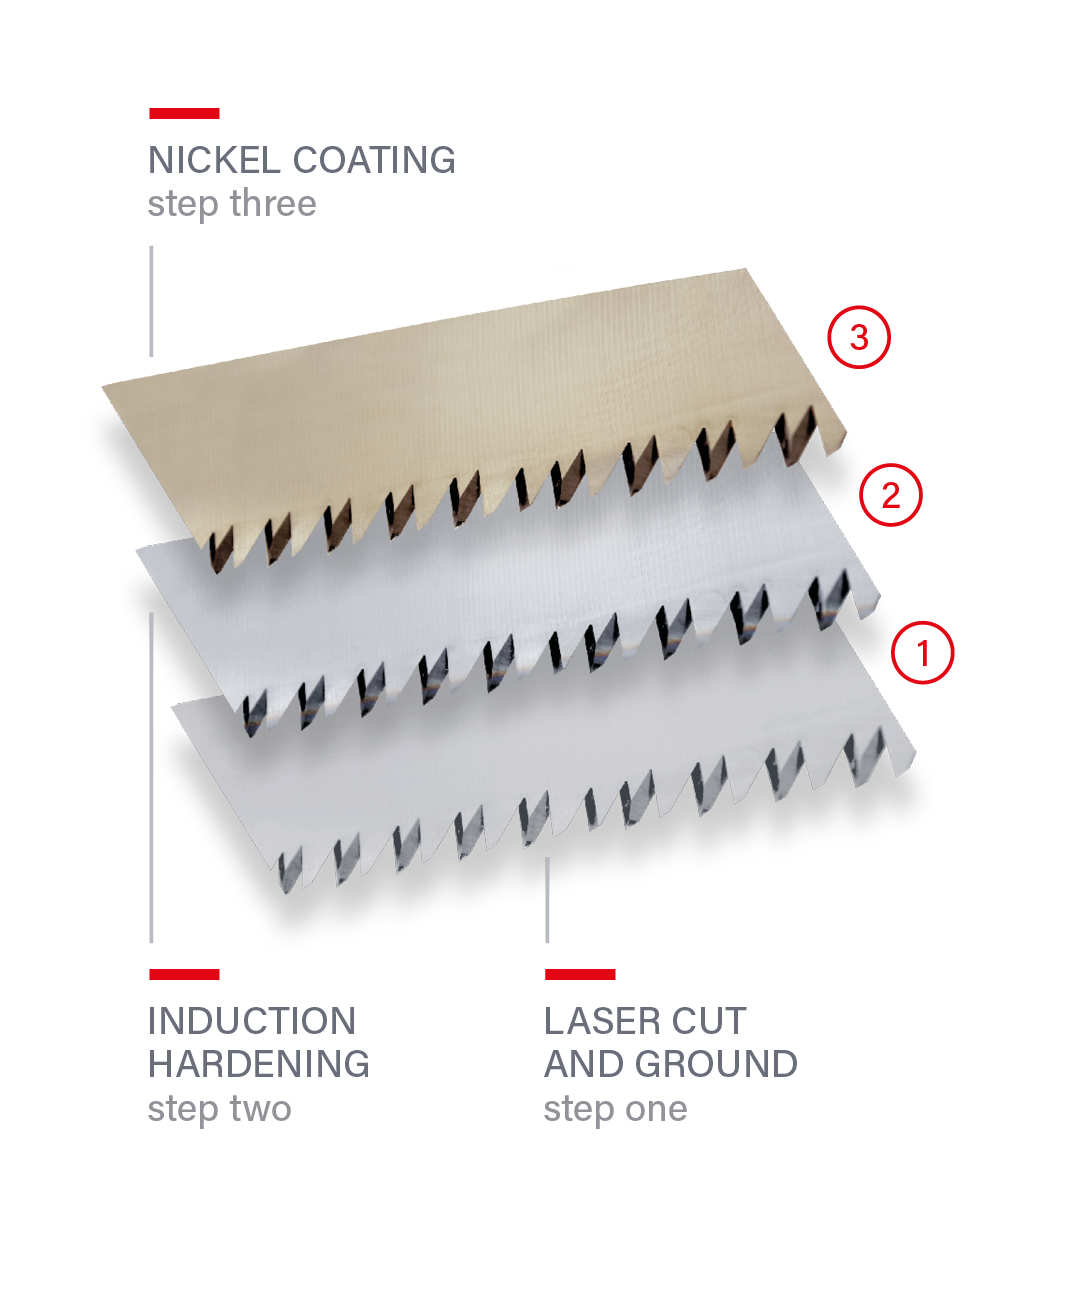 Nickel coating